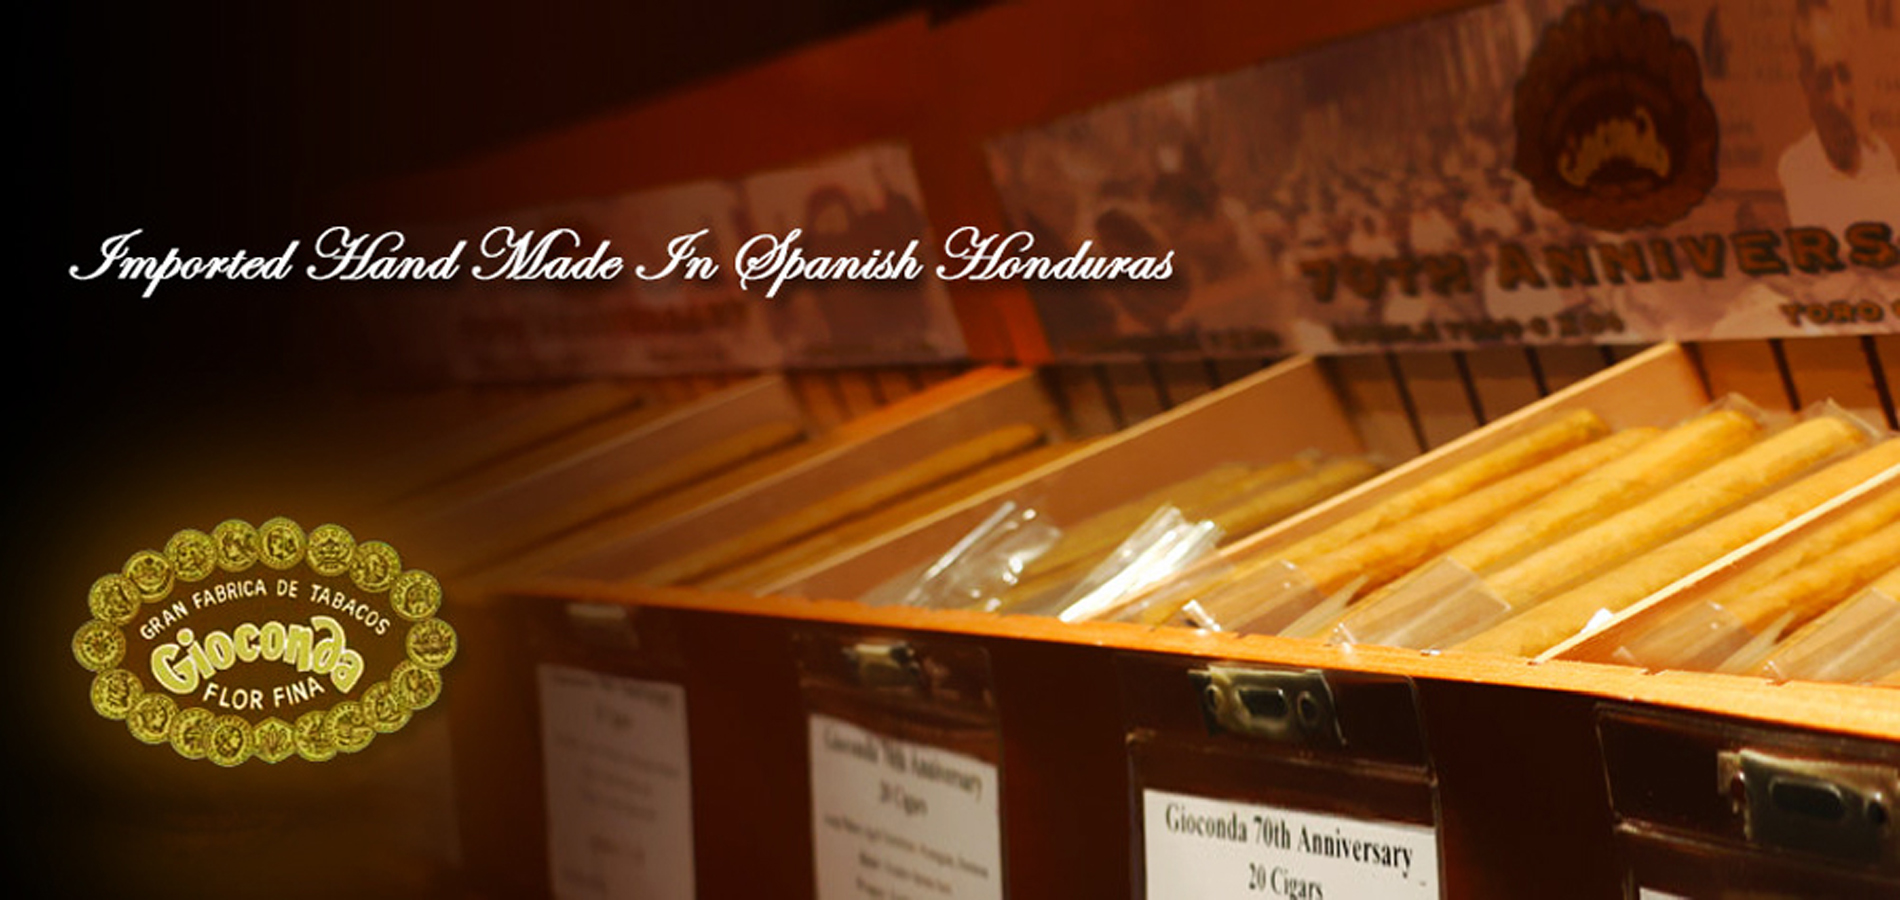 Gioconda-Cigars-Tampa-Florida-Area